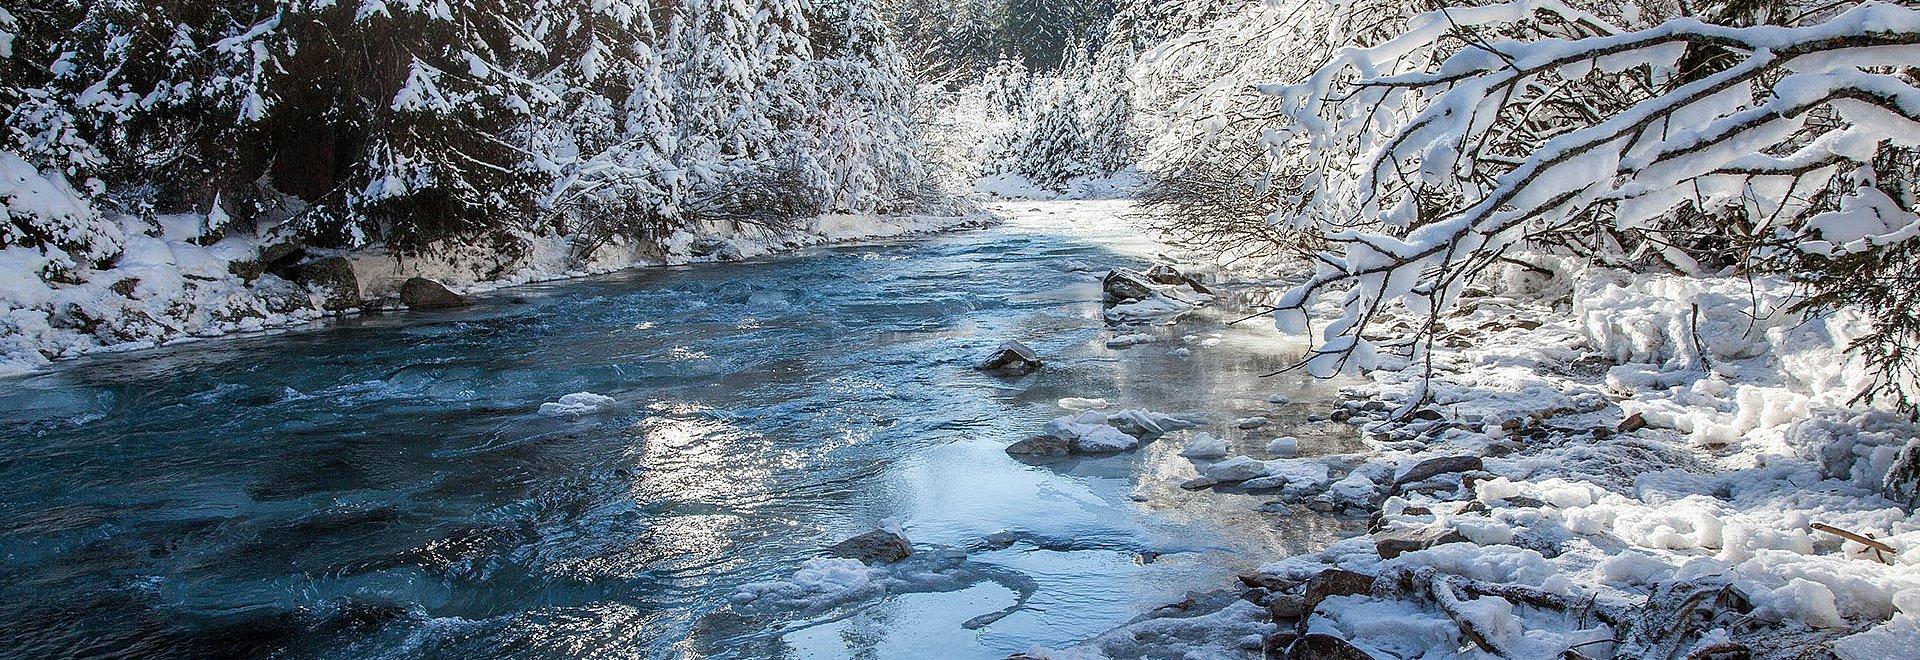 Winterlandschaft in St. Leonhard